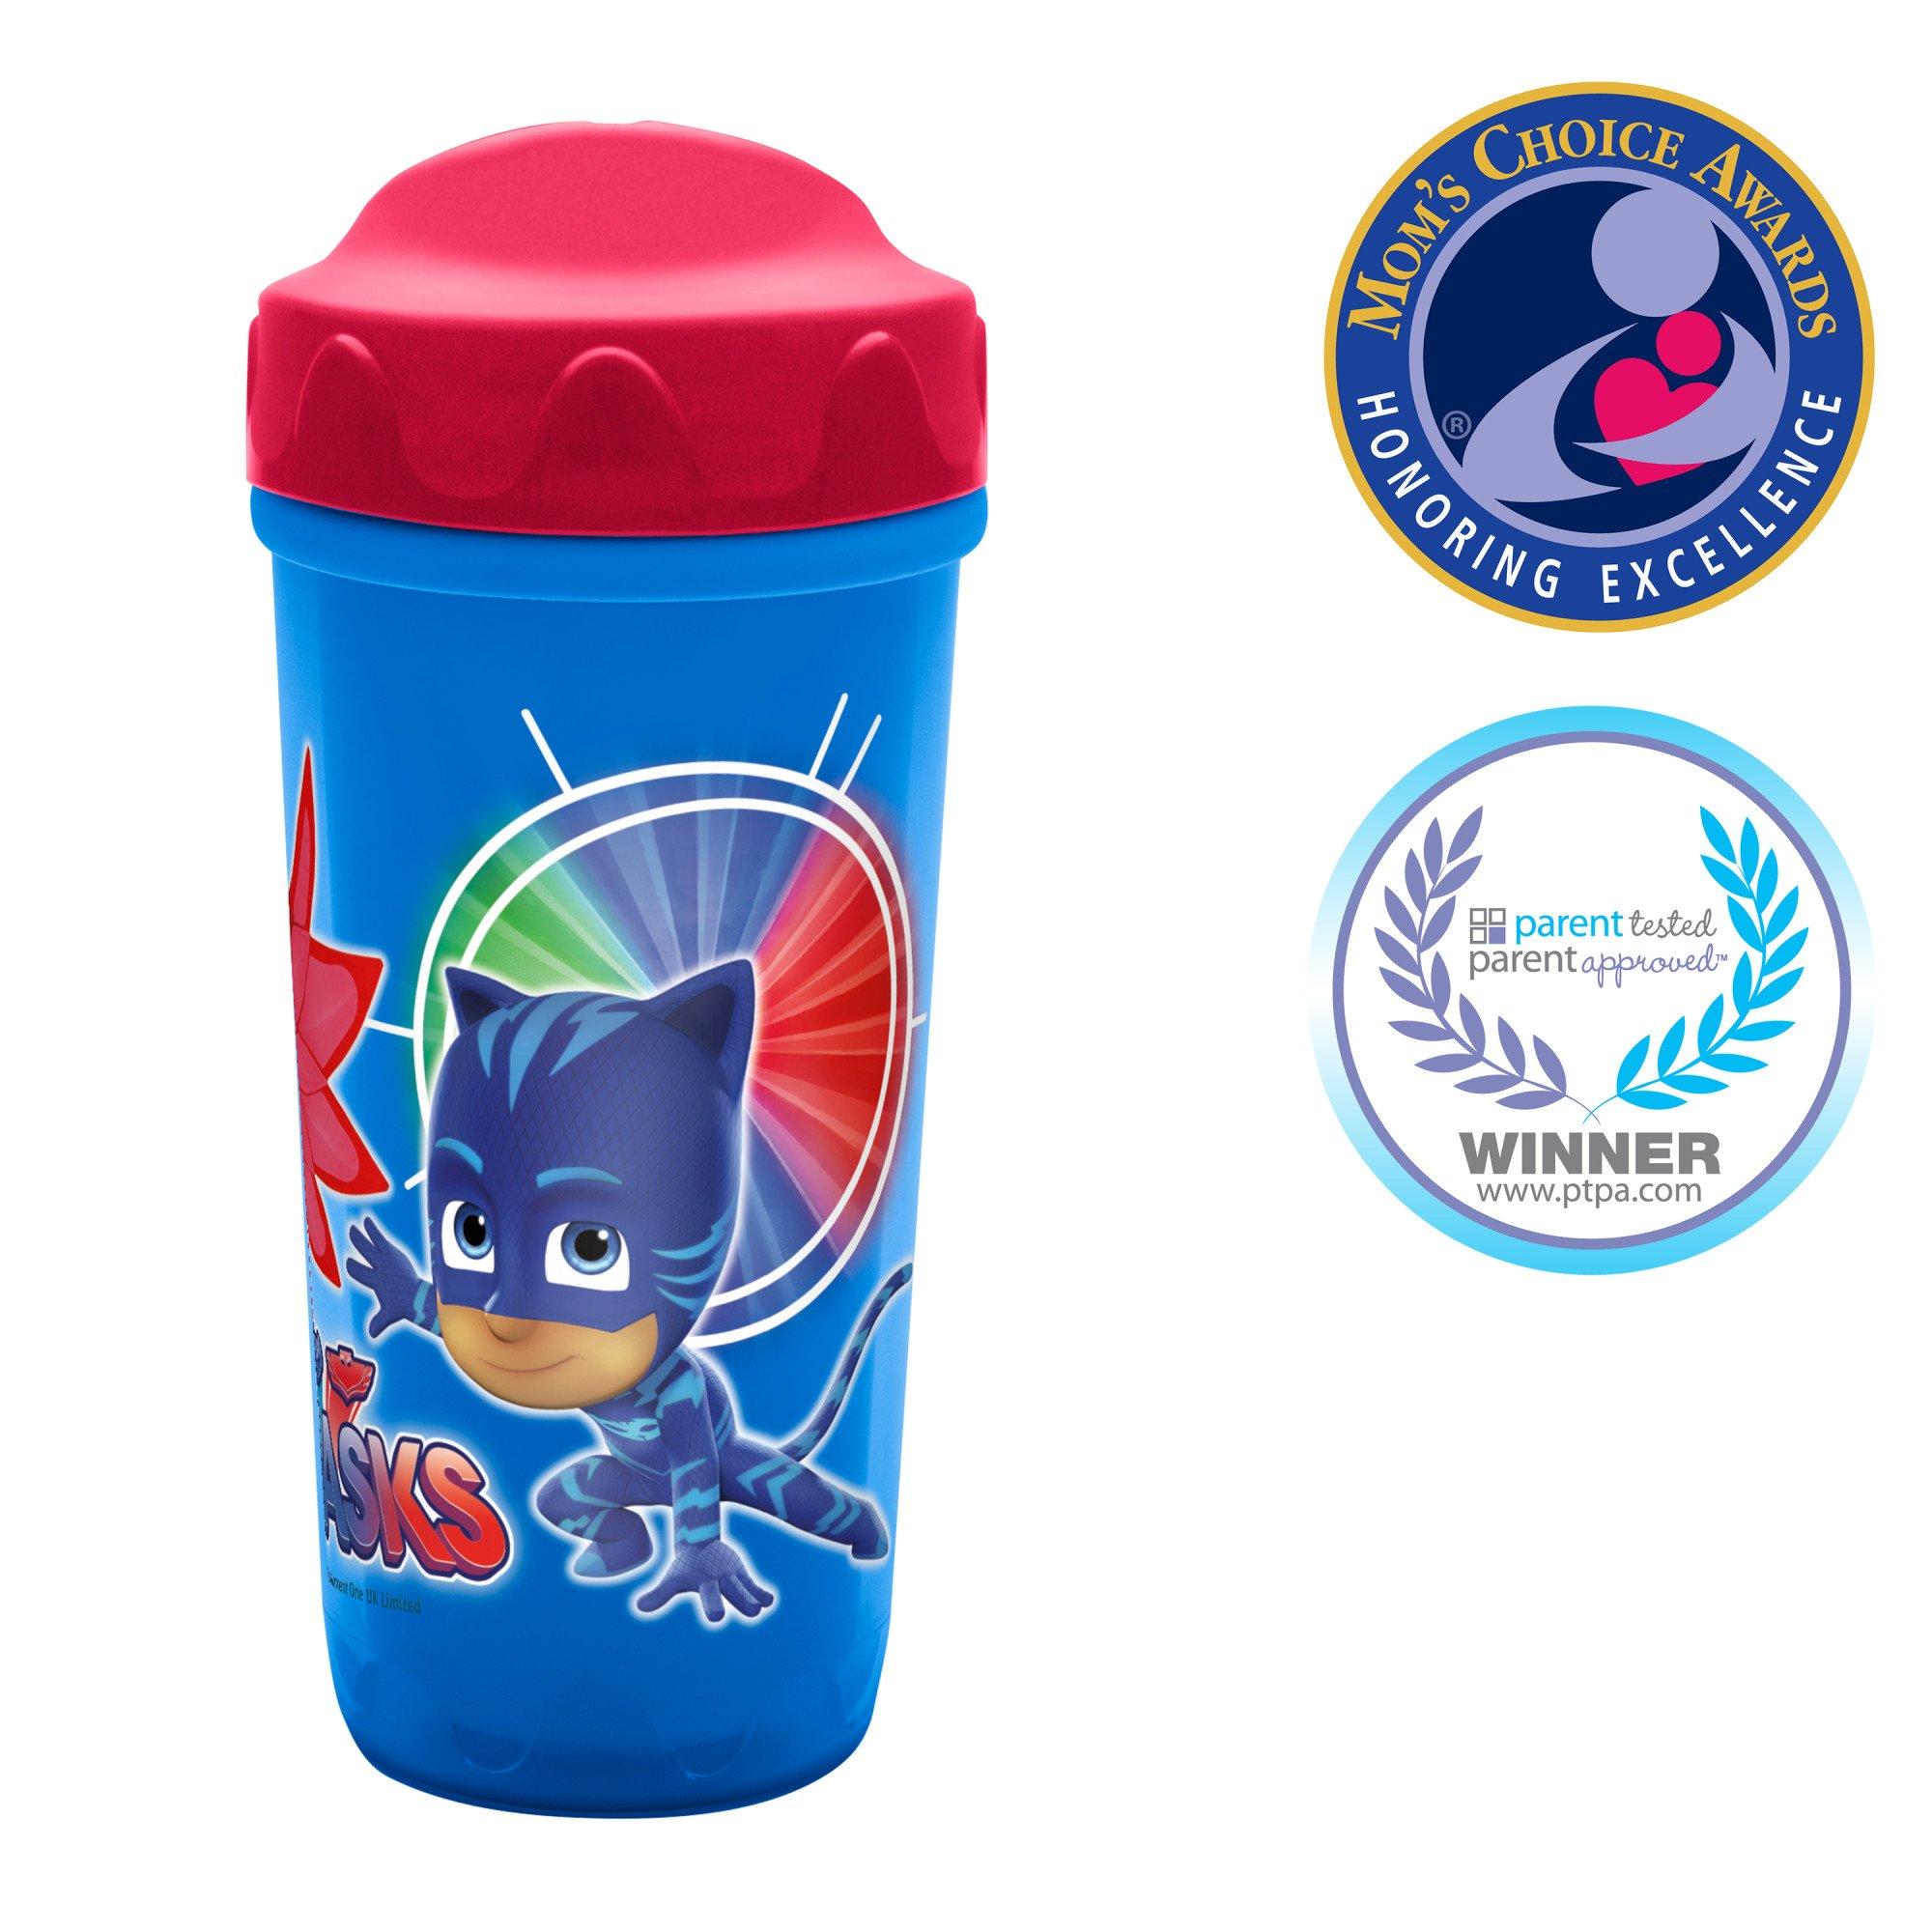 e052e5d30 Amazon.com  Zak Designs PJMB-M010 Toodlerific Sippy Cups 1 Pack PJ ...